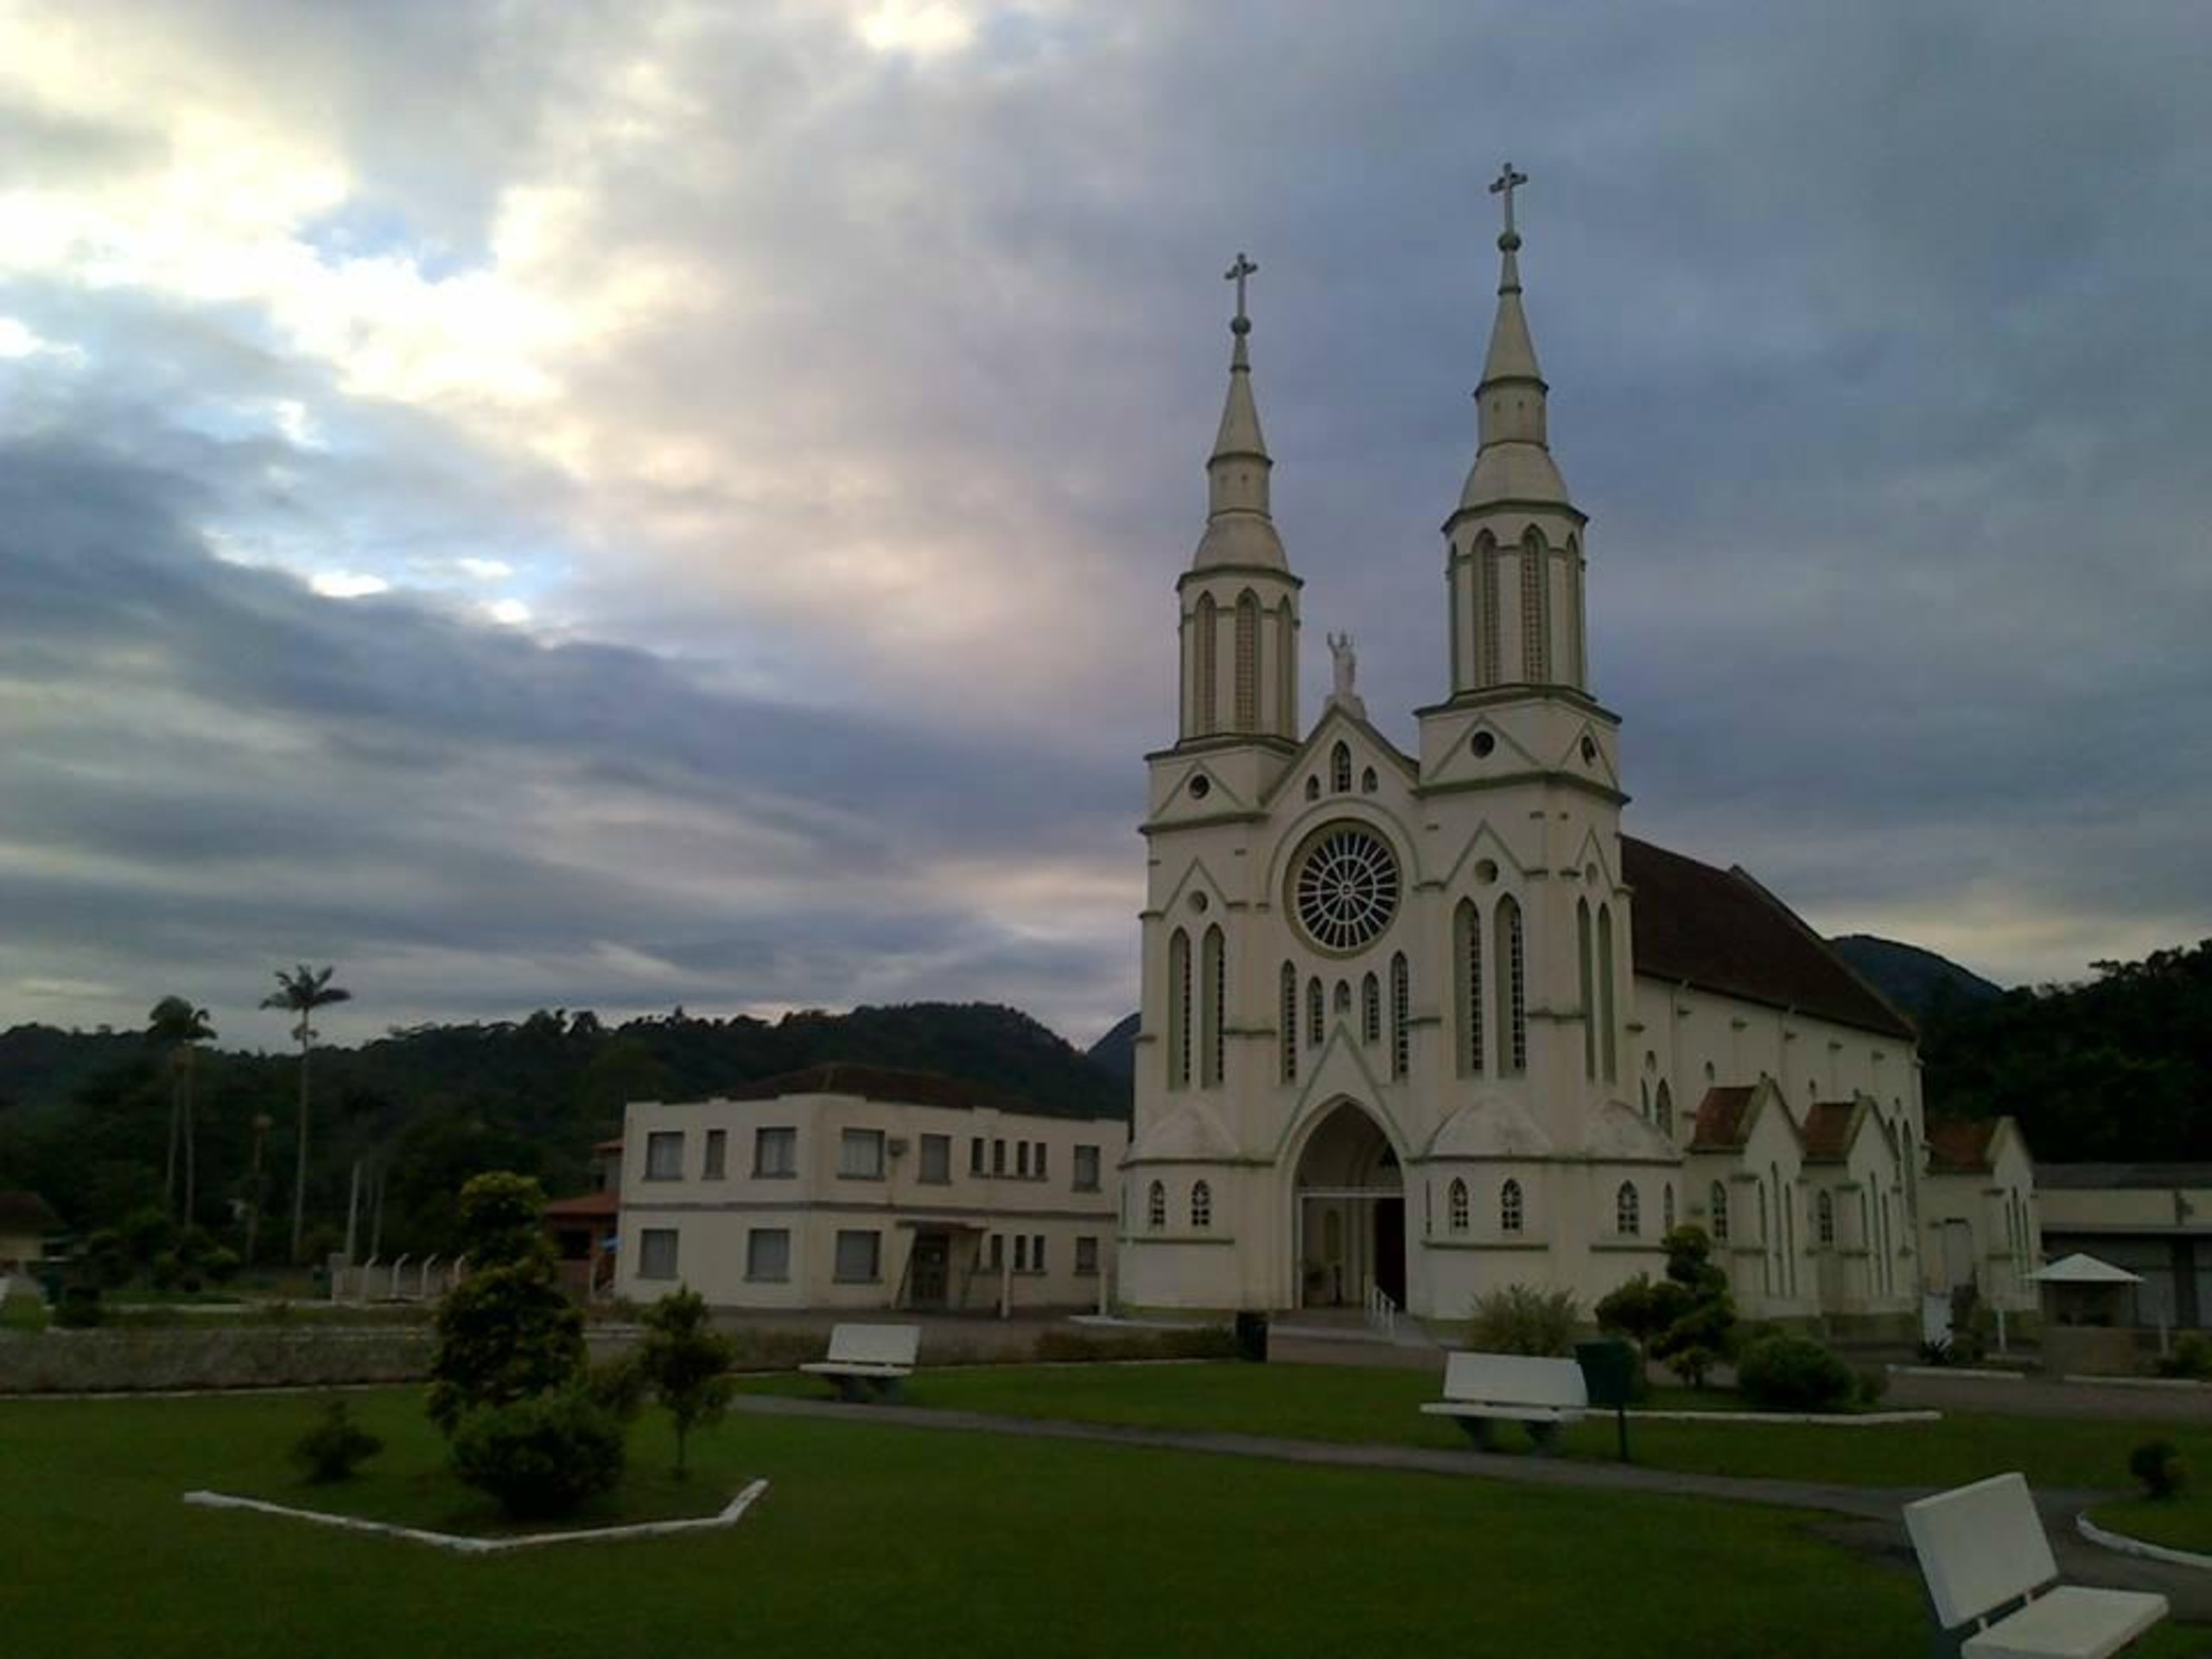 Apiúna Santa Catarina fonte: media-cdn.tripadvisor.com